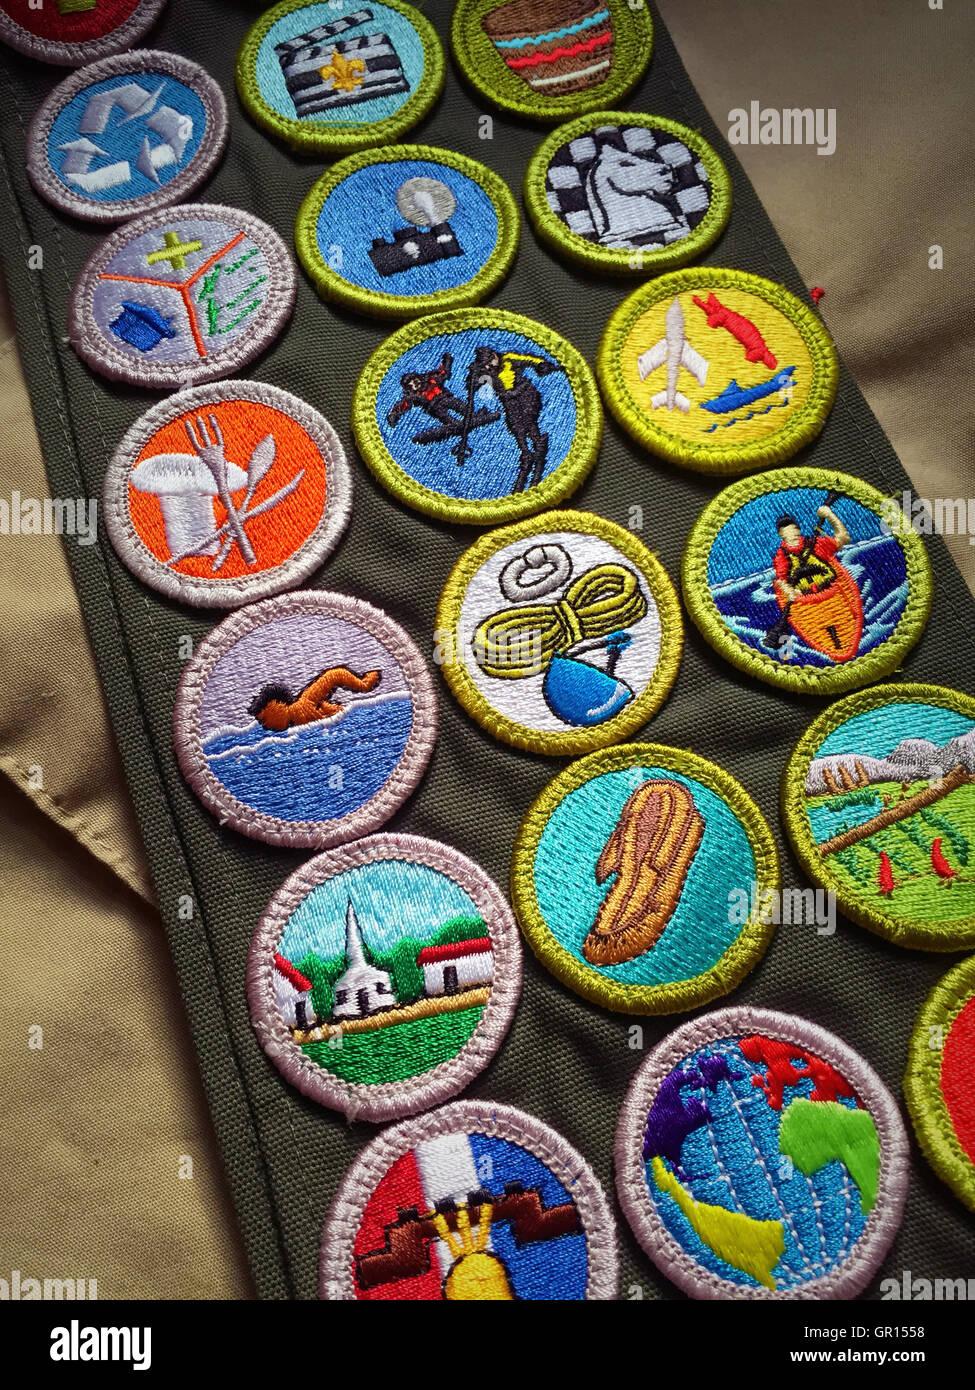 Merit Badge Sash, Boy Scouts of America, USA - Stock Image